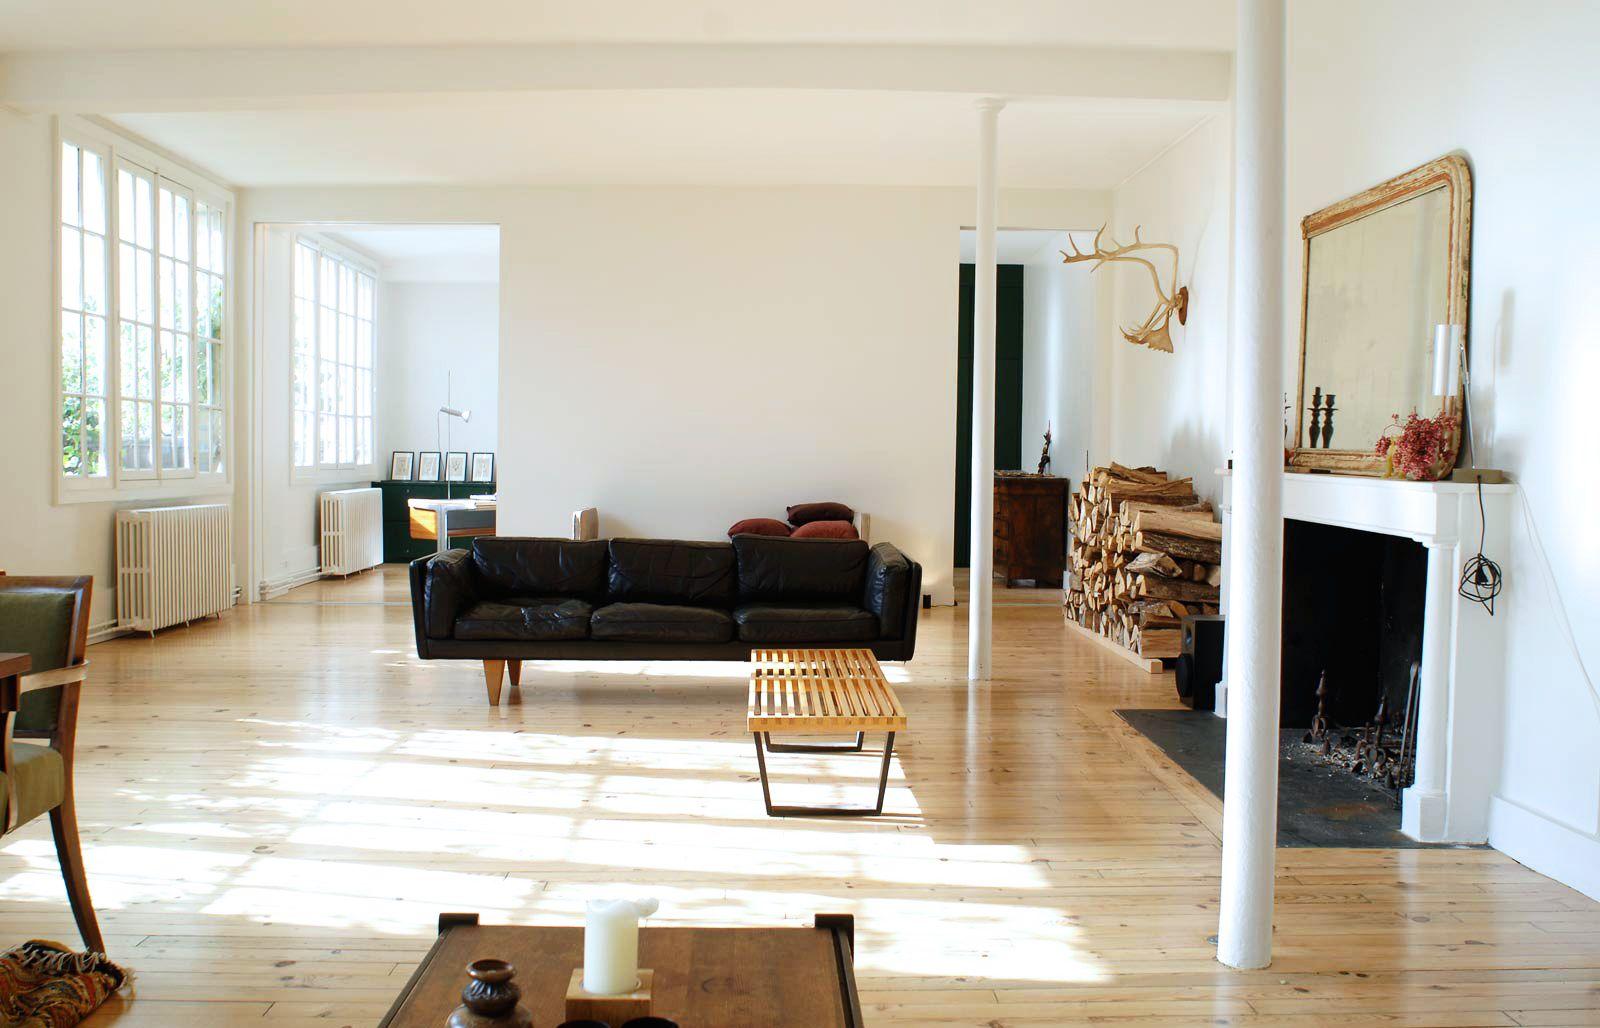 Tour A Minimal Rustic Paris Apartment